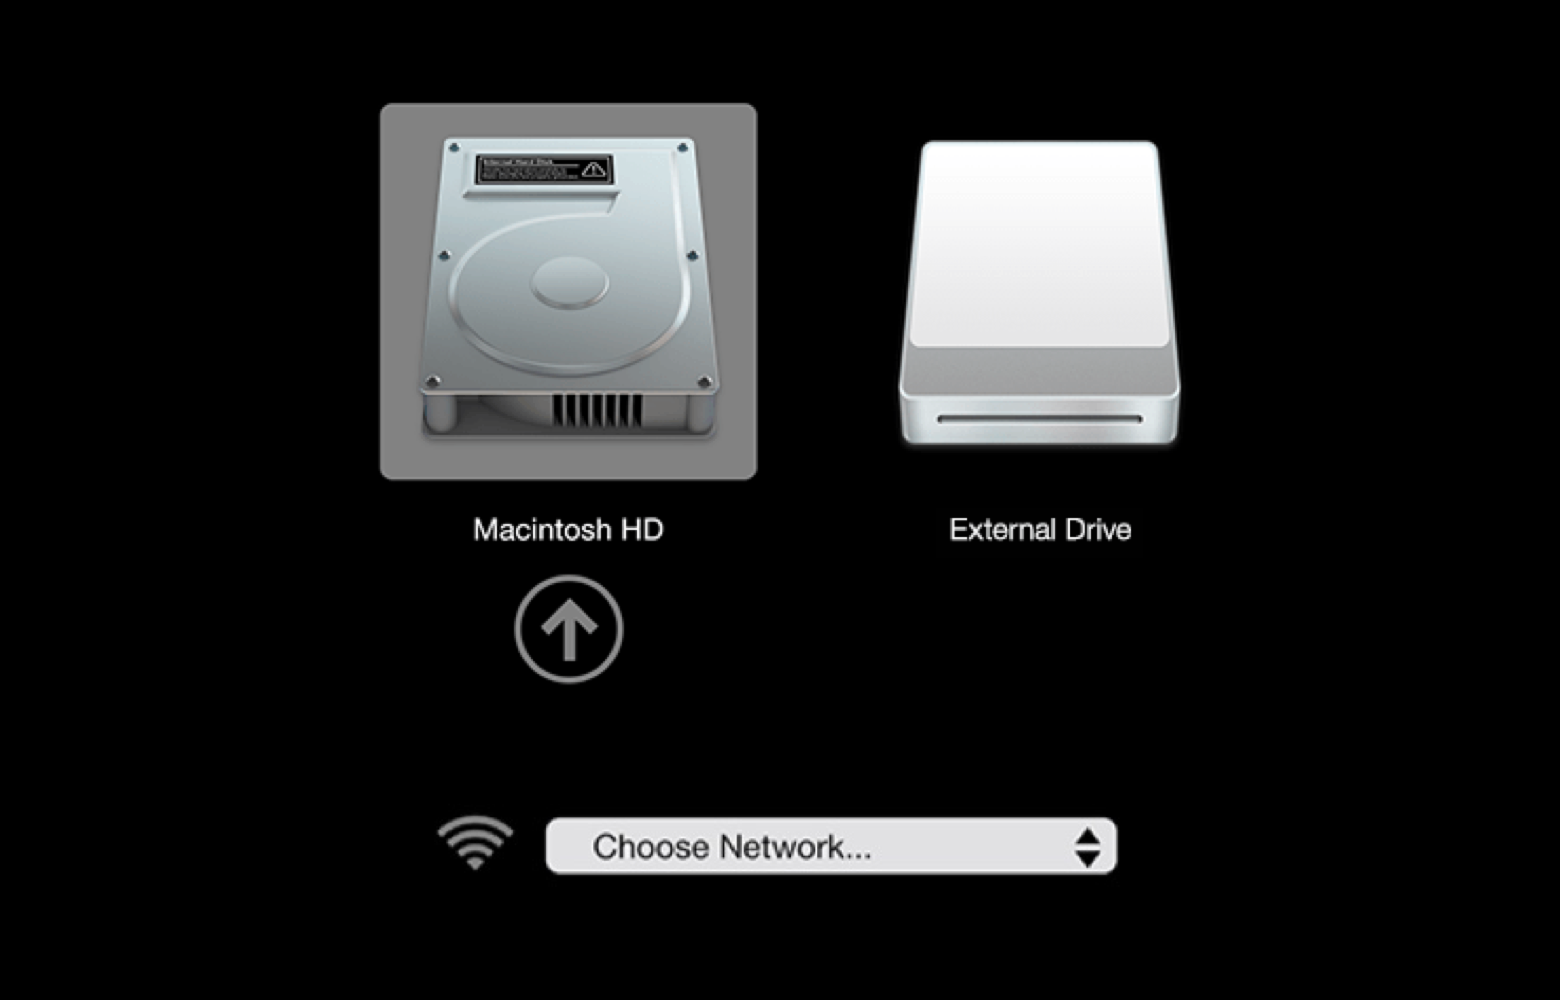 Check disk drive